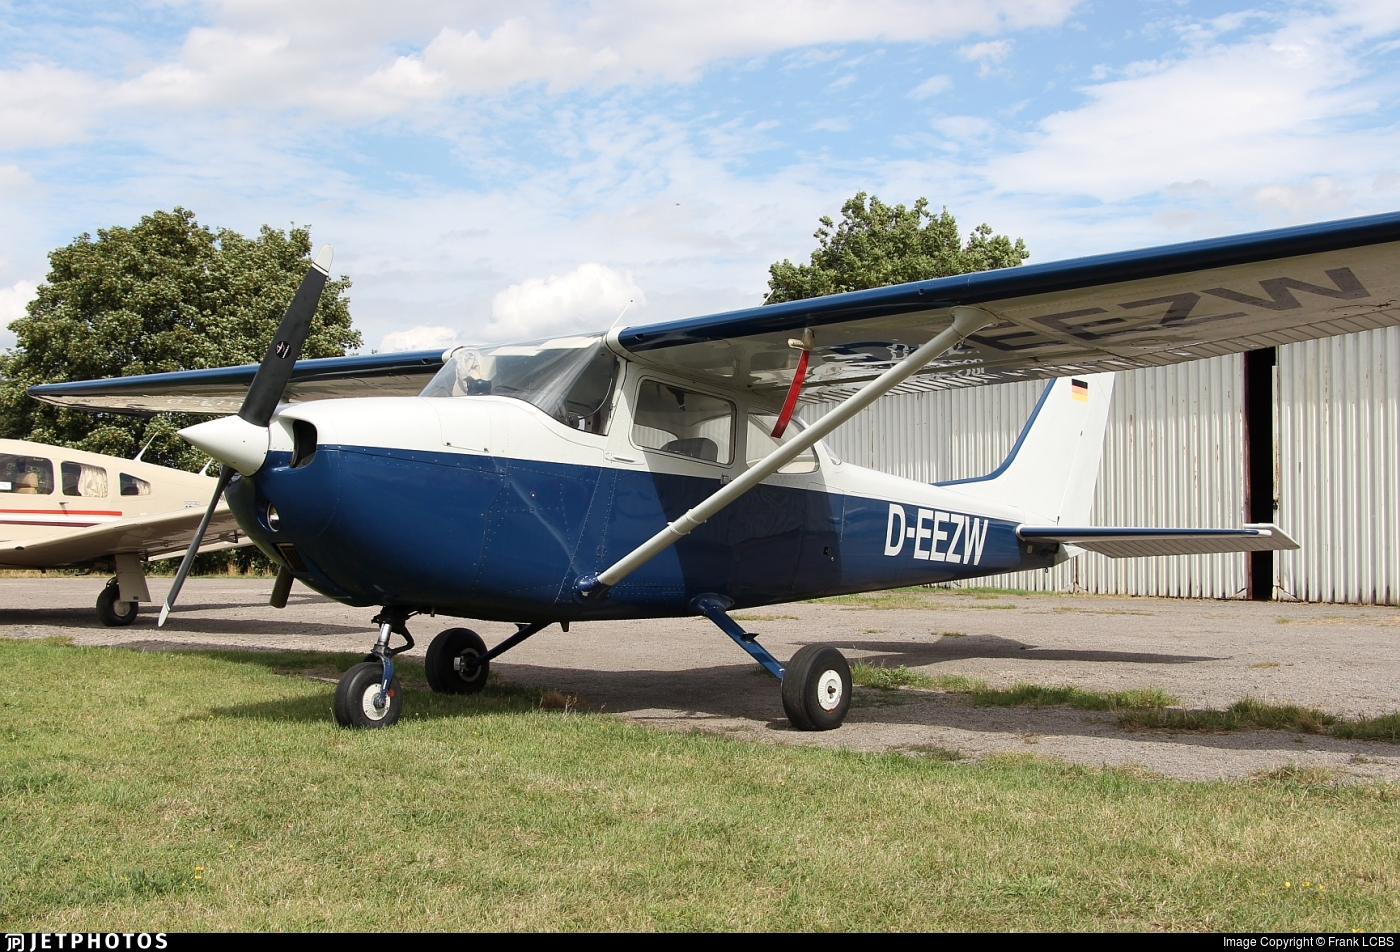 D-EEZW - Reims-Cessna F172L Skyhawk - Private